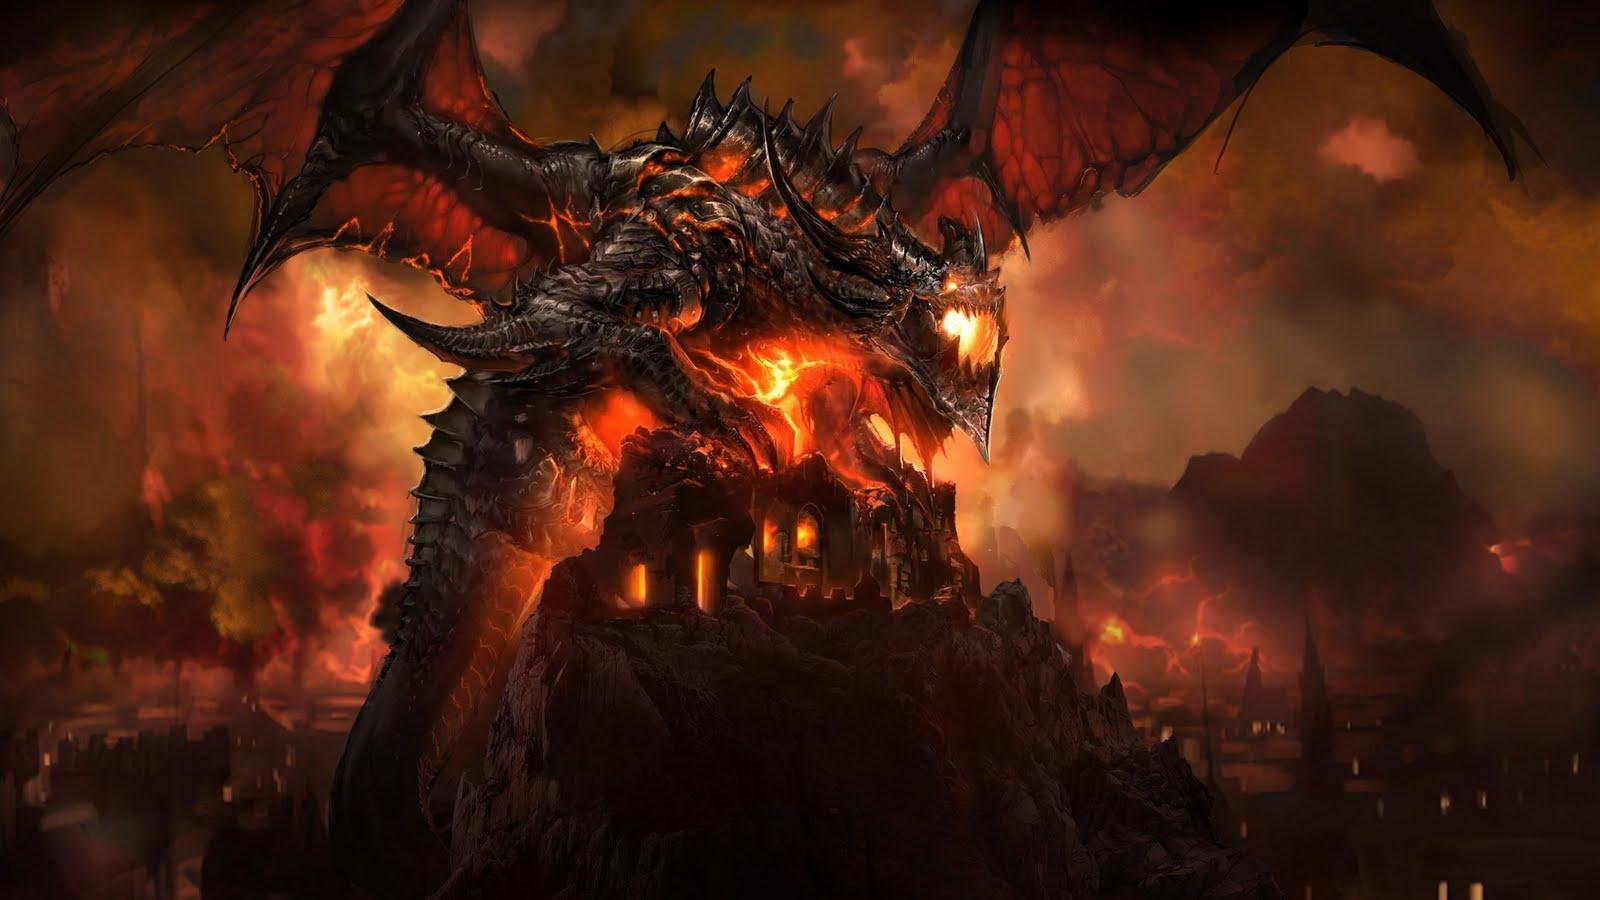 8000 Wallpaper Black Dragon HD Terbaru